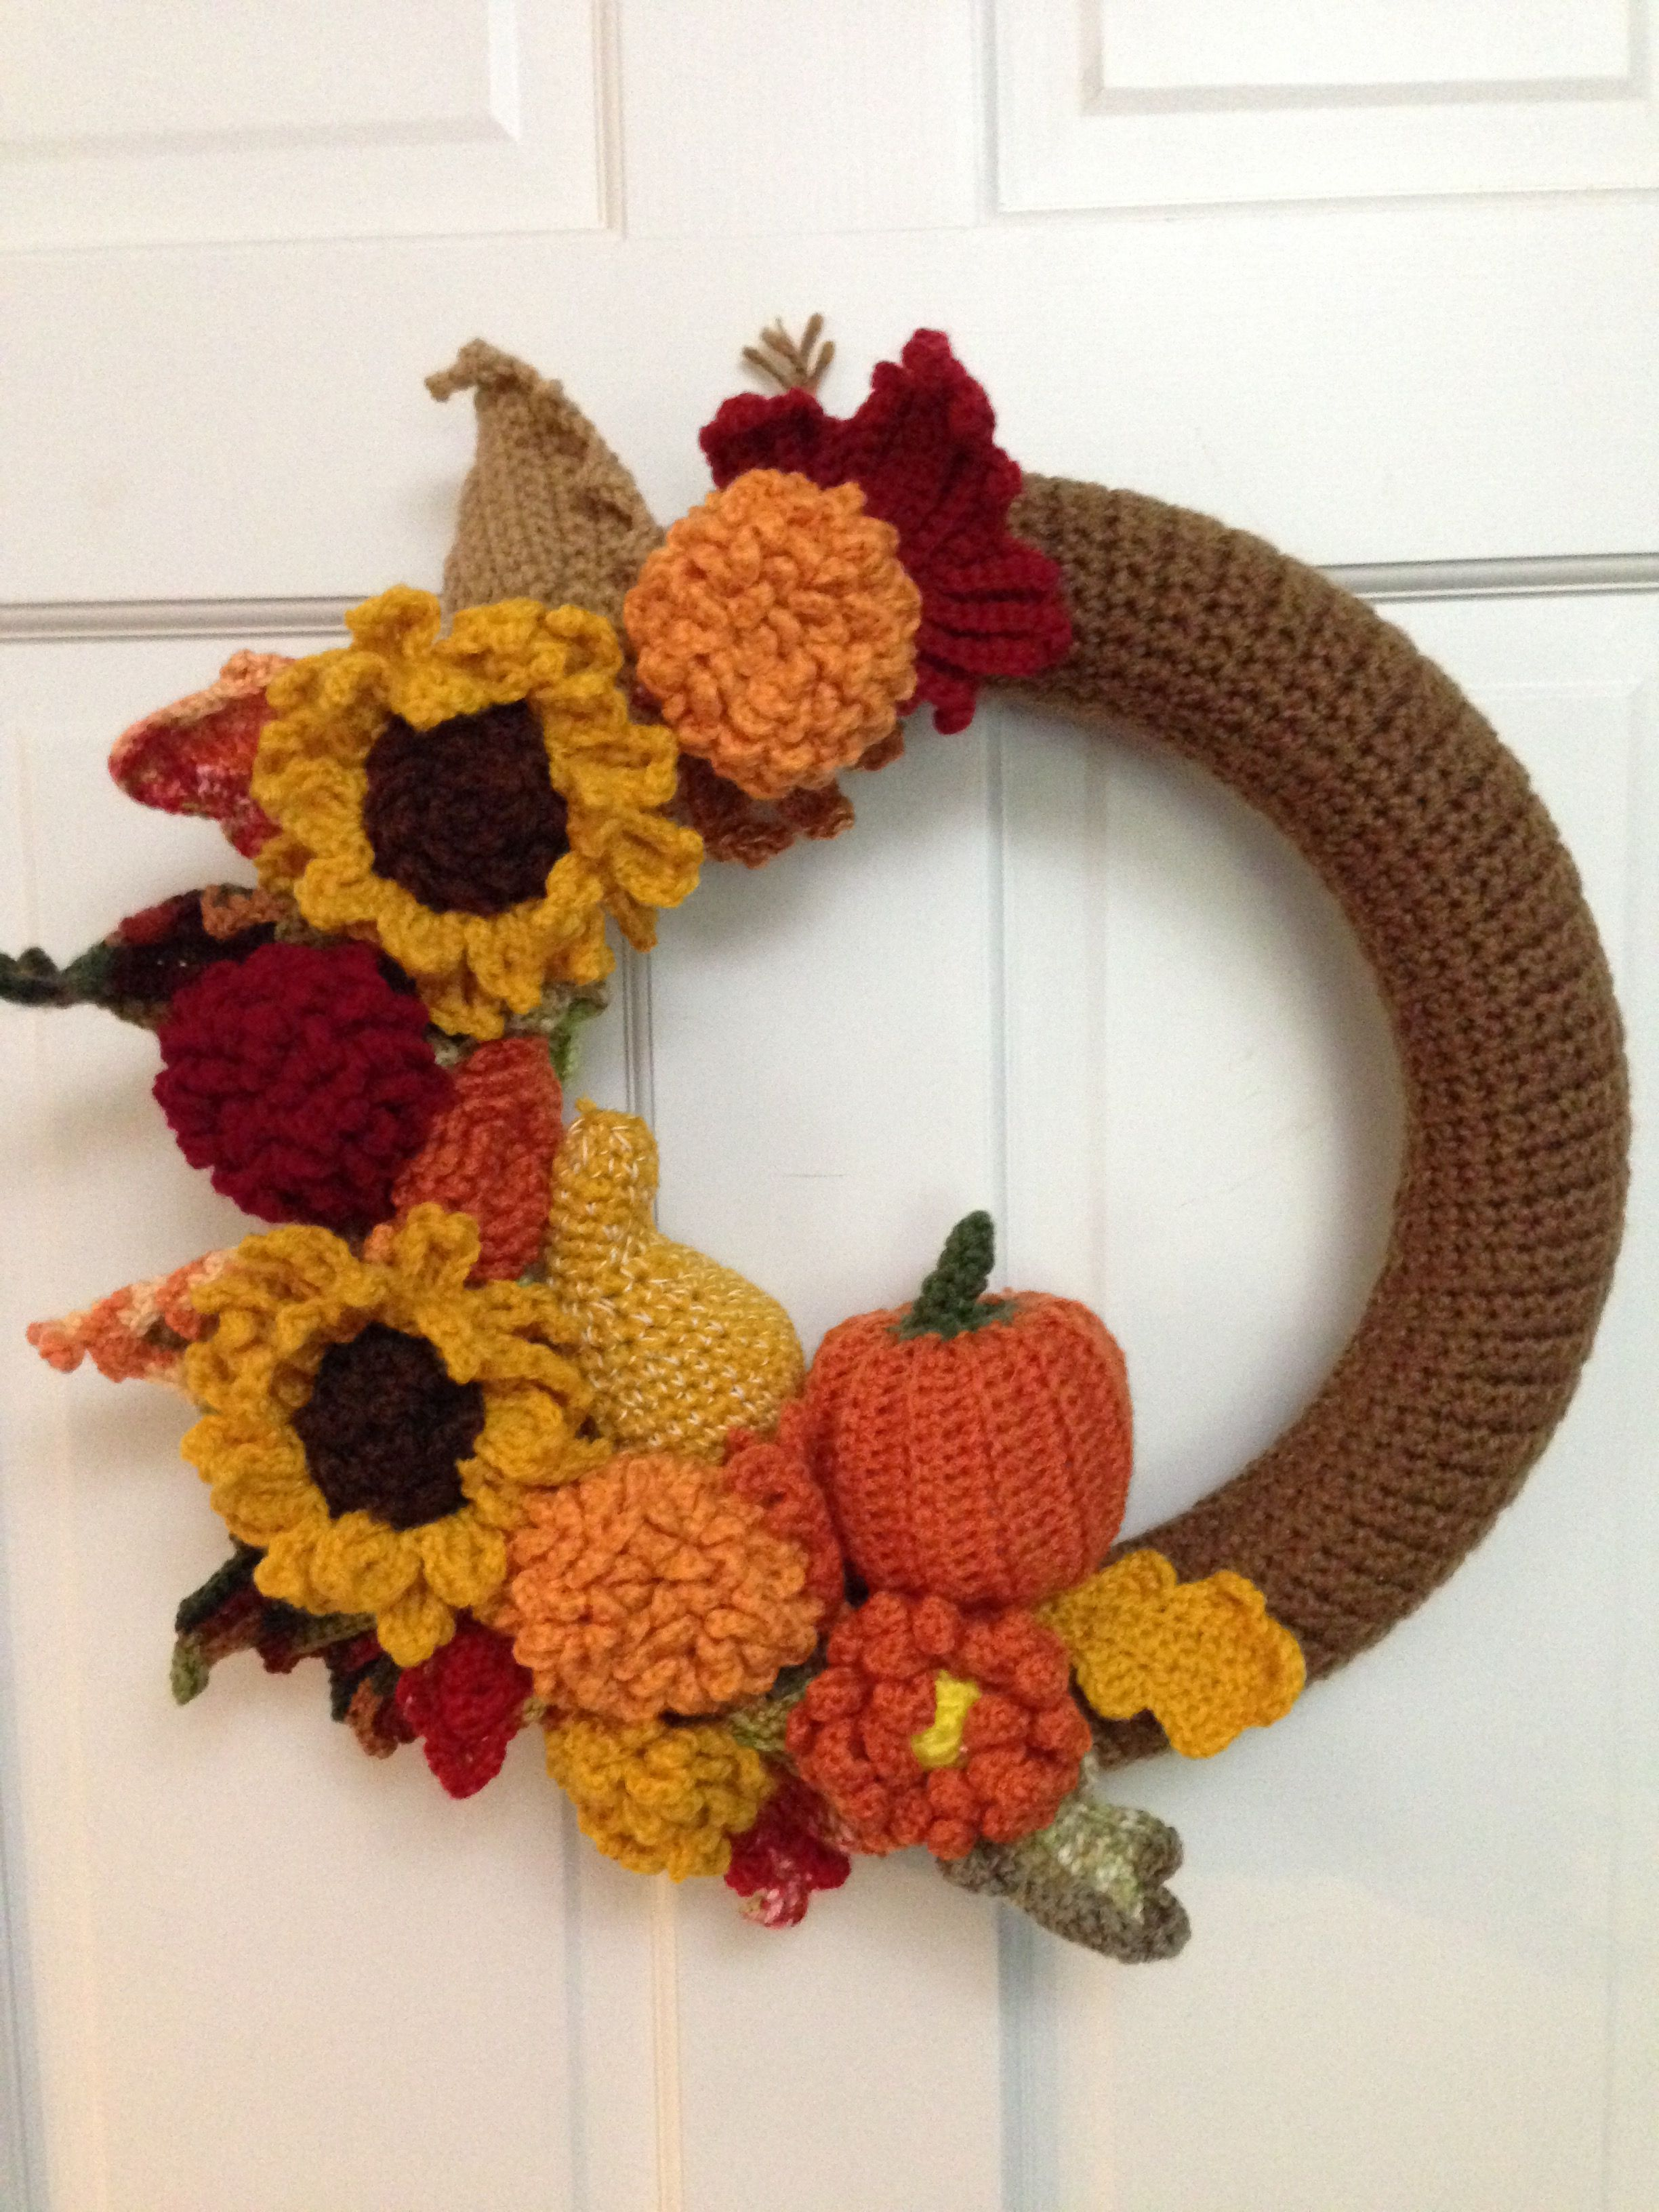 Fall wreath made from various crochet patterns | Crochet - shawls ...